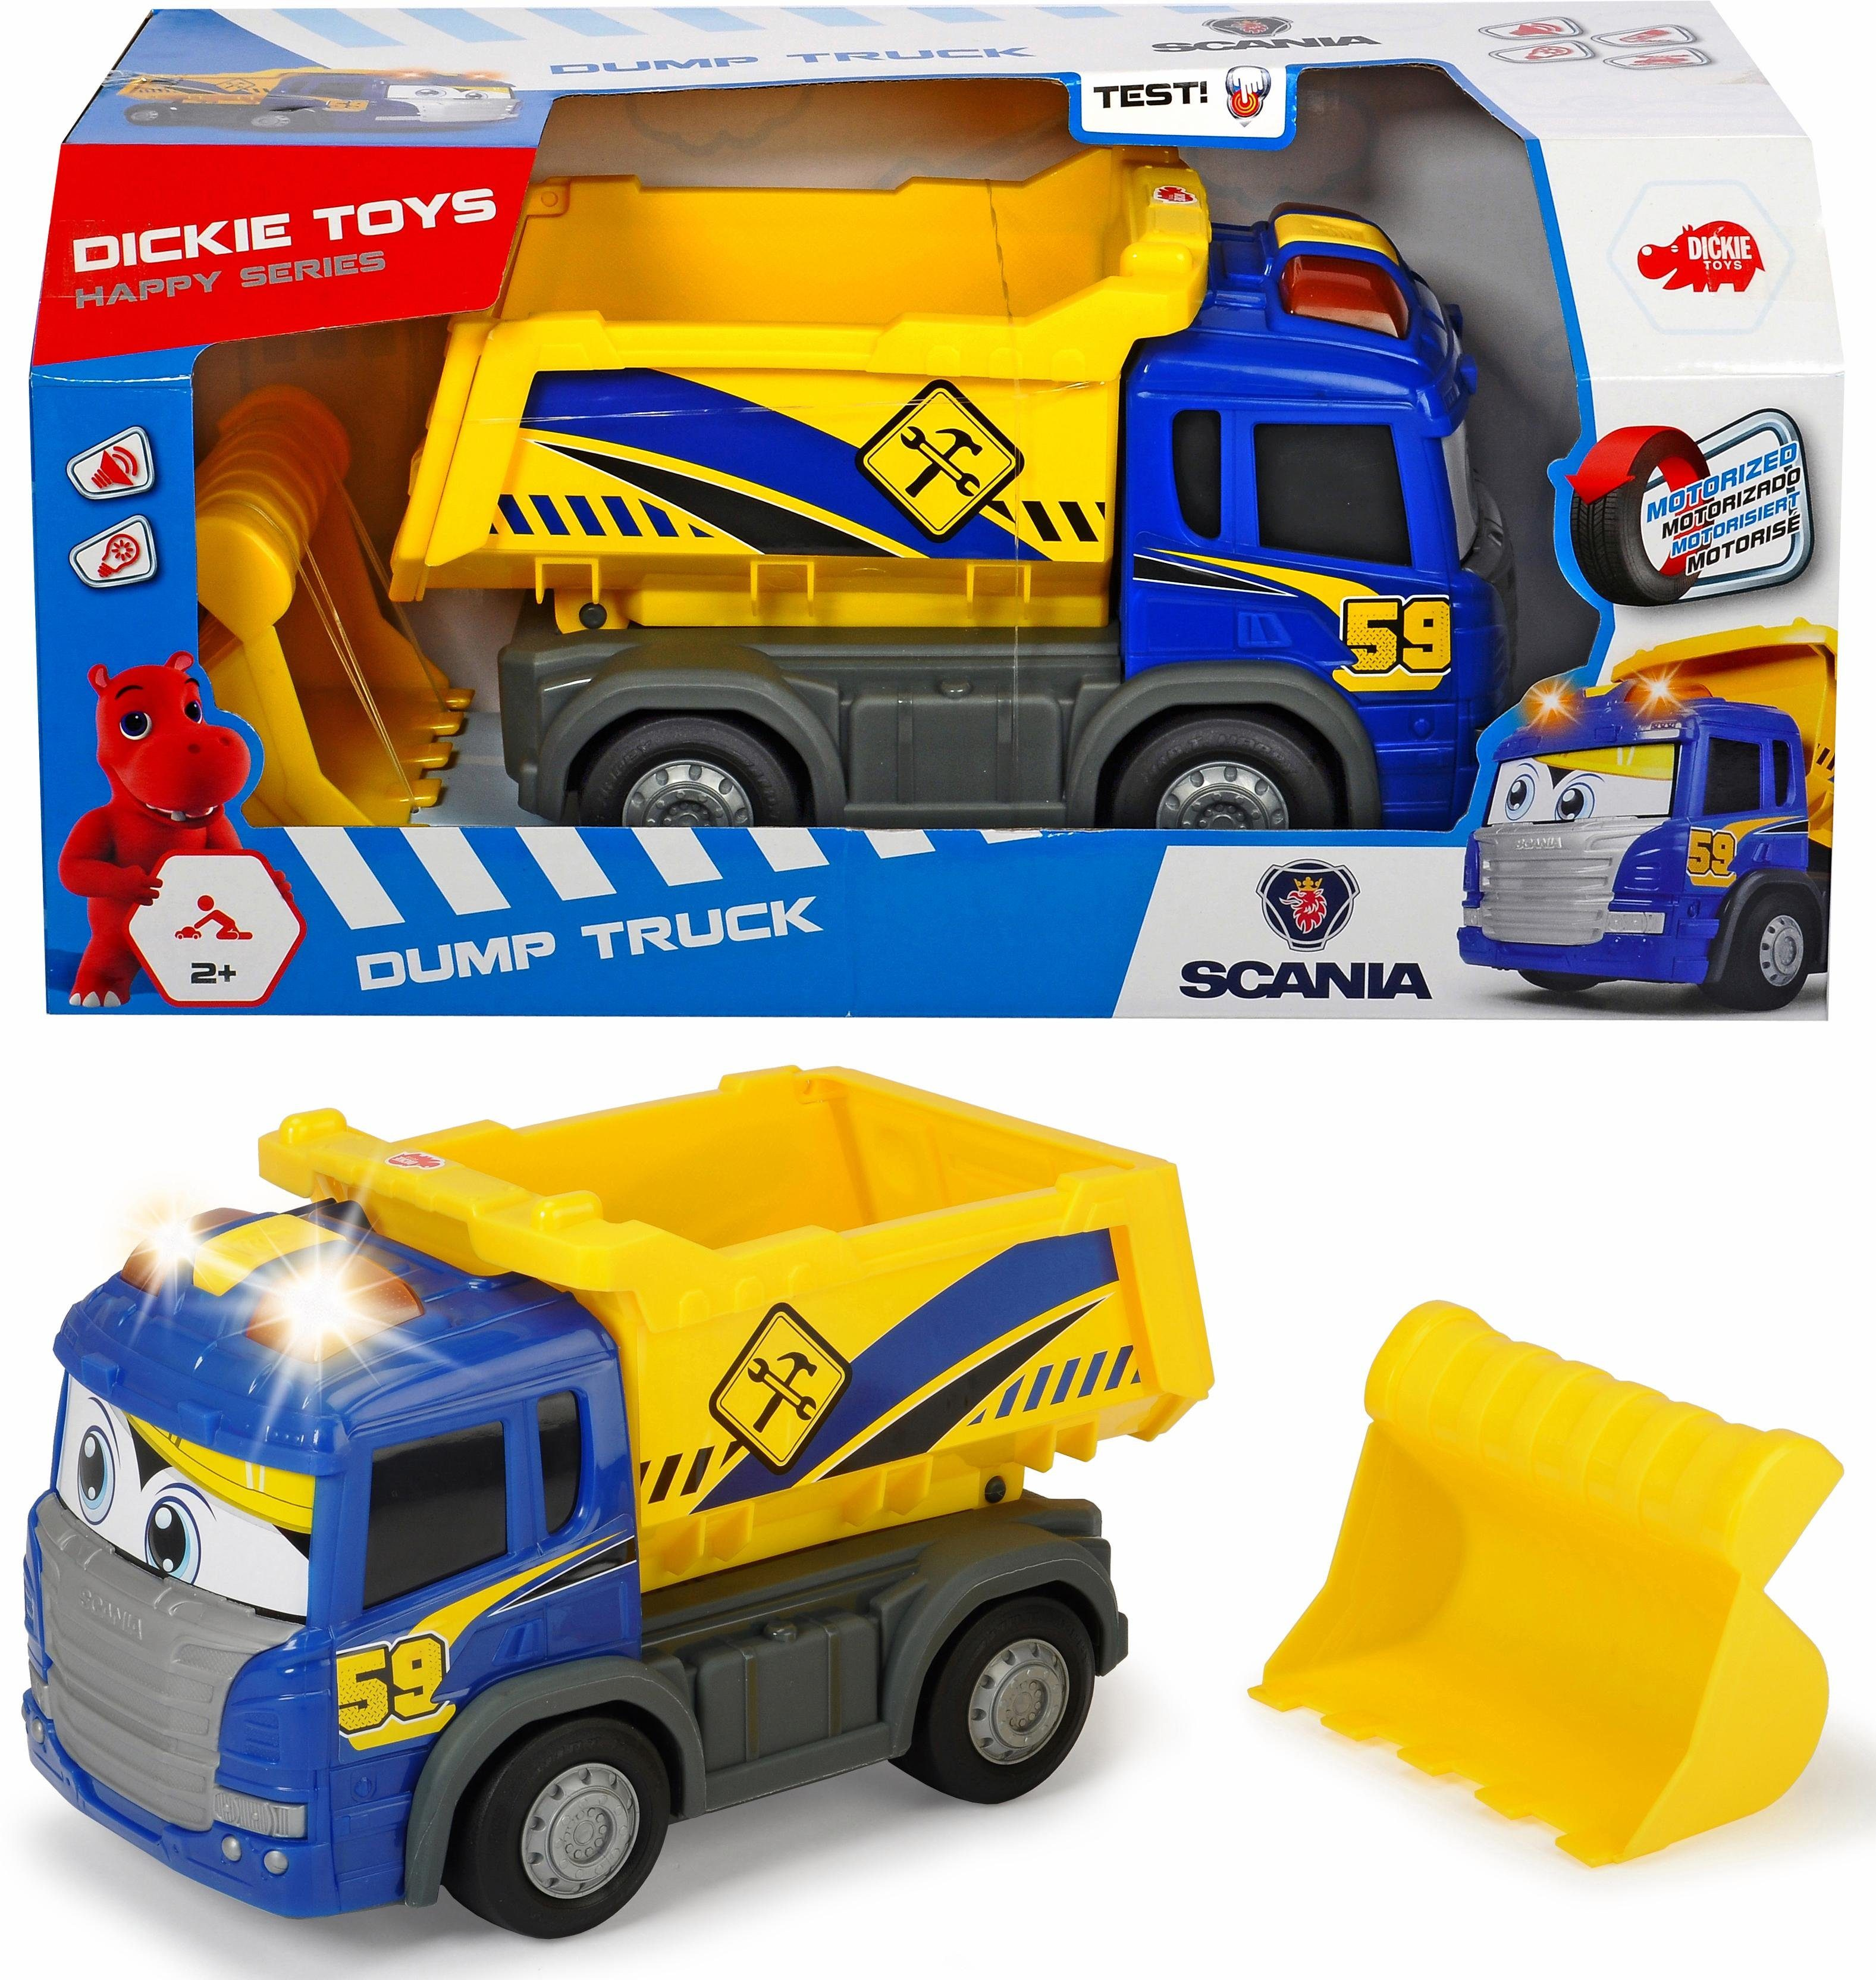 Dickie Toys Spielzeug LKW Muldenkipper motorisiert, »Dump Truck«